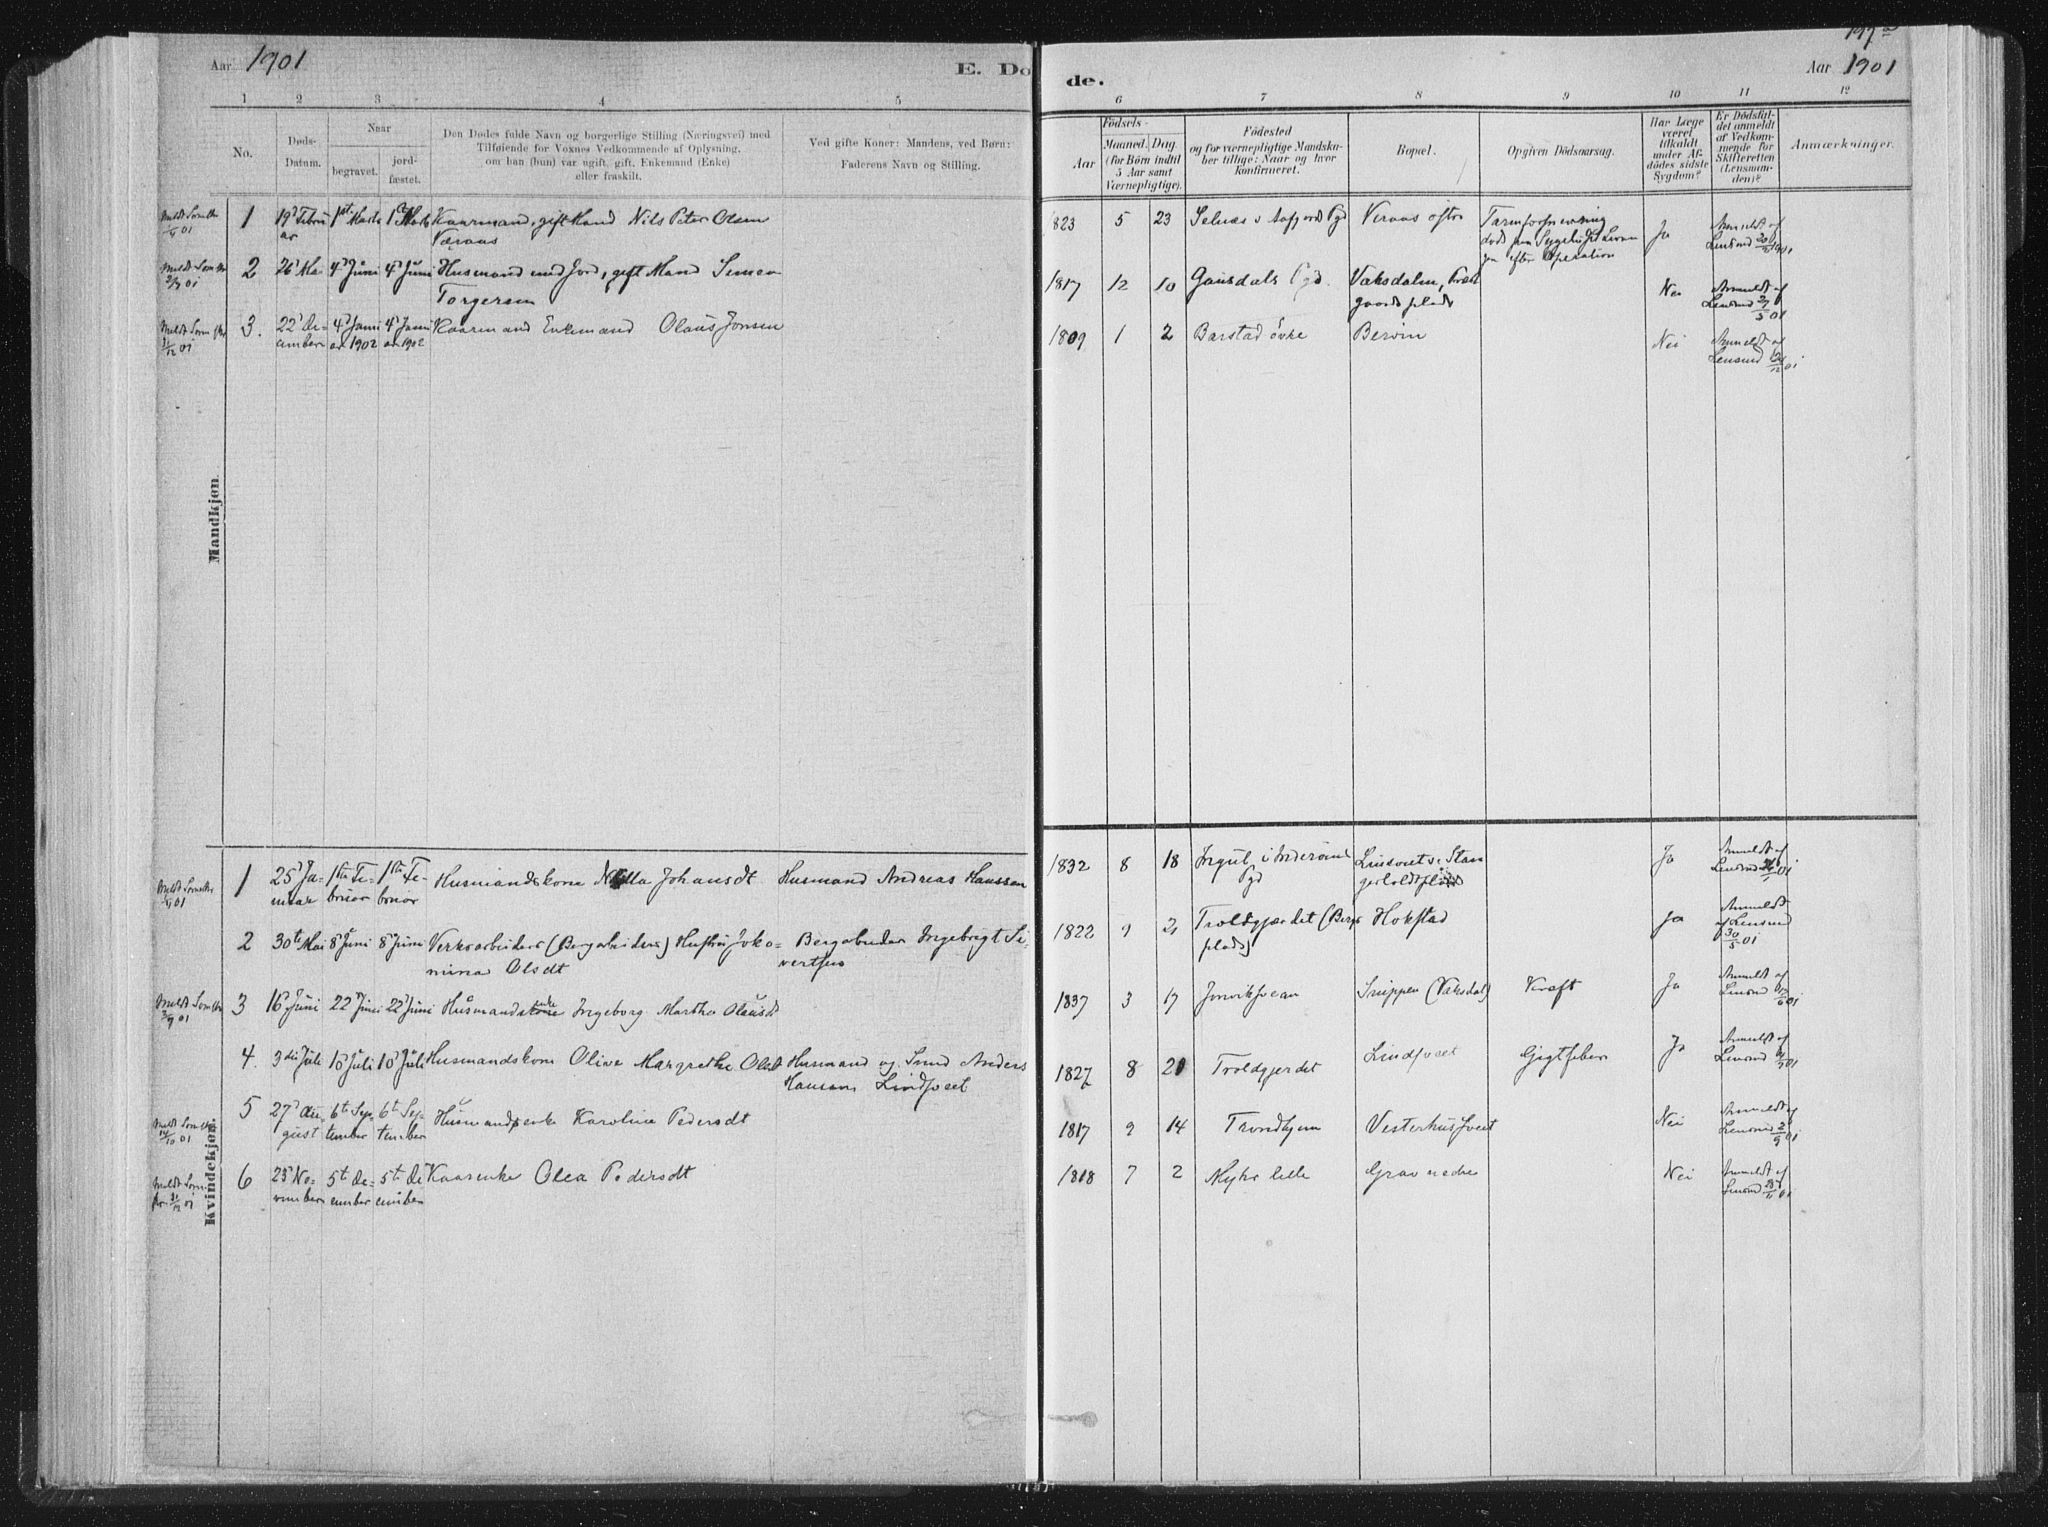 SAT, Ministerialprotokoller, klokkerbøker og fødselsregistre - Nord-Trøndelag, 722/L0220: Ministerialbok nr. 722A07, 1881-1908, s. 197a